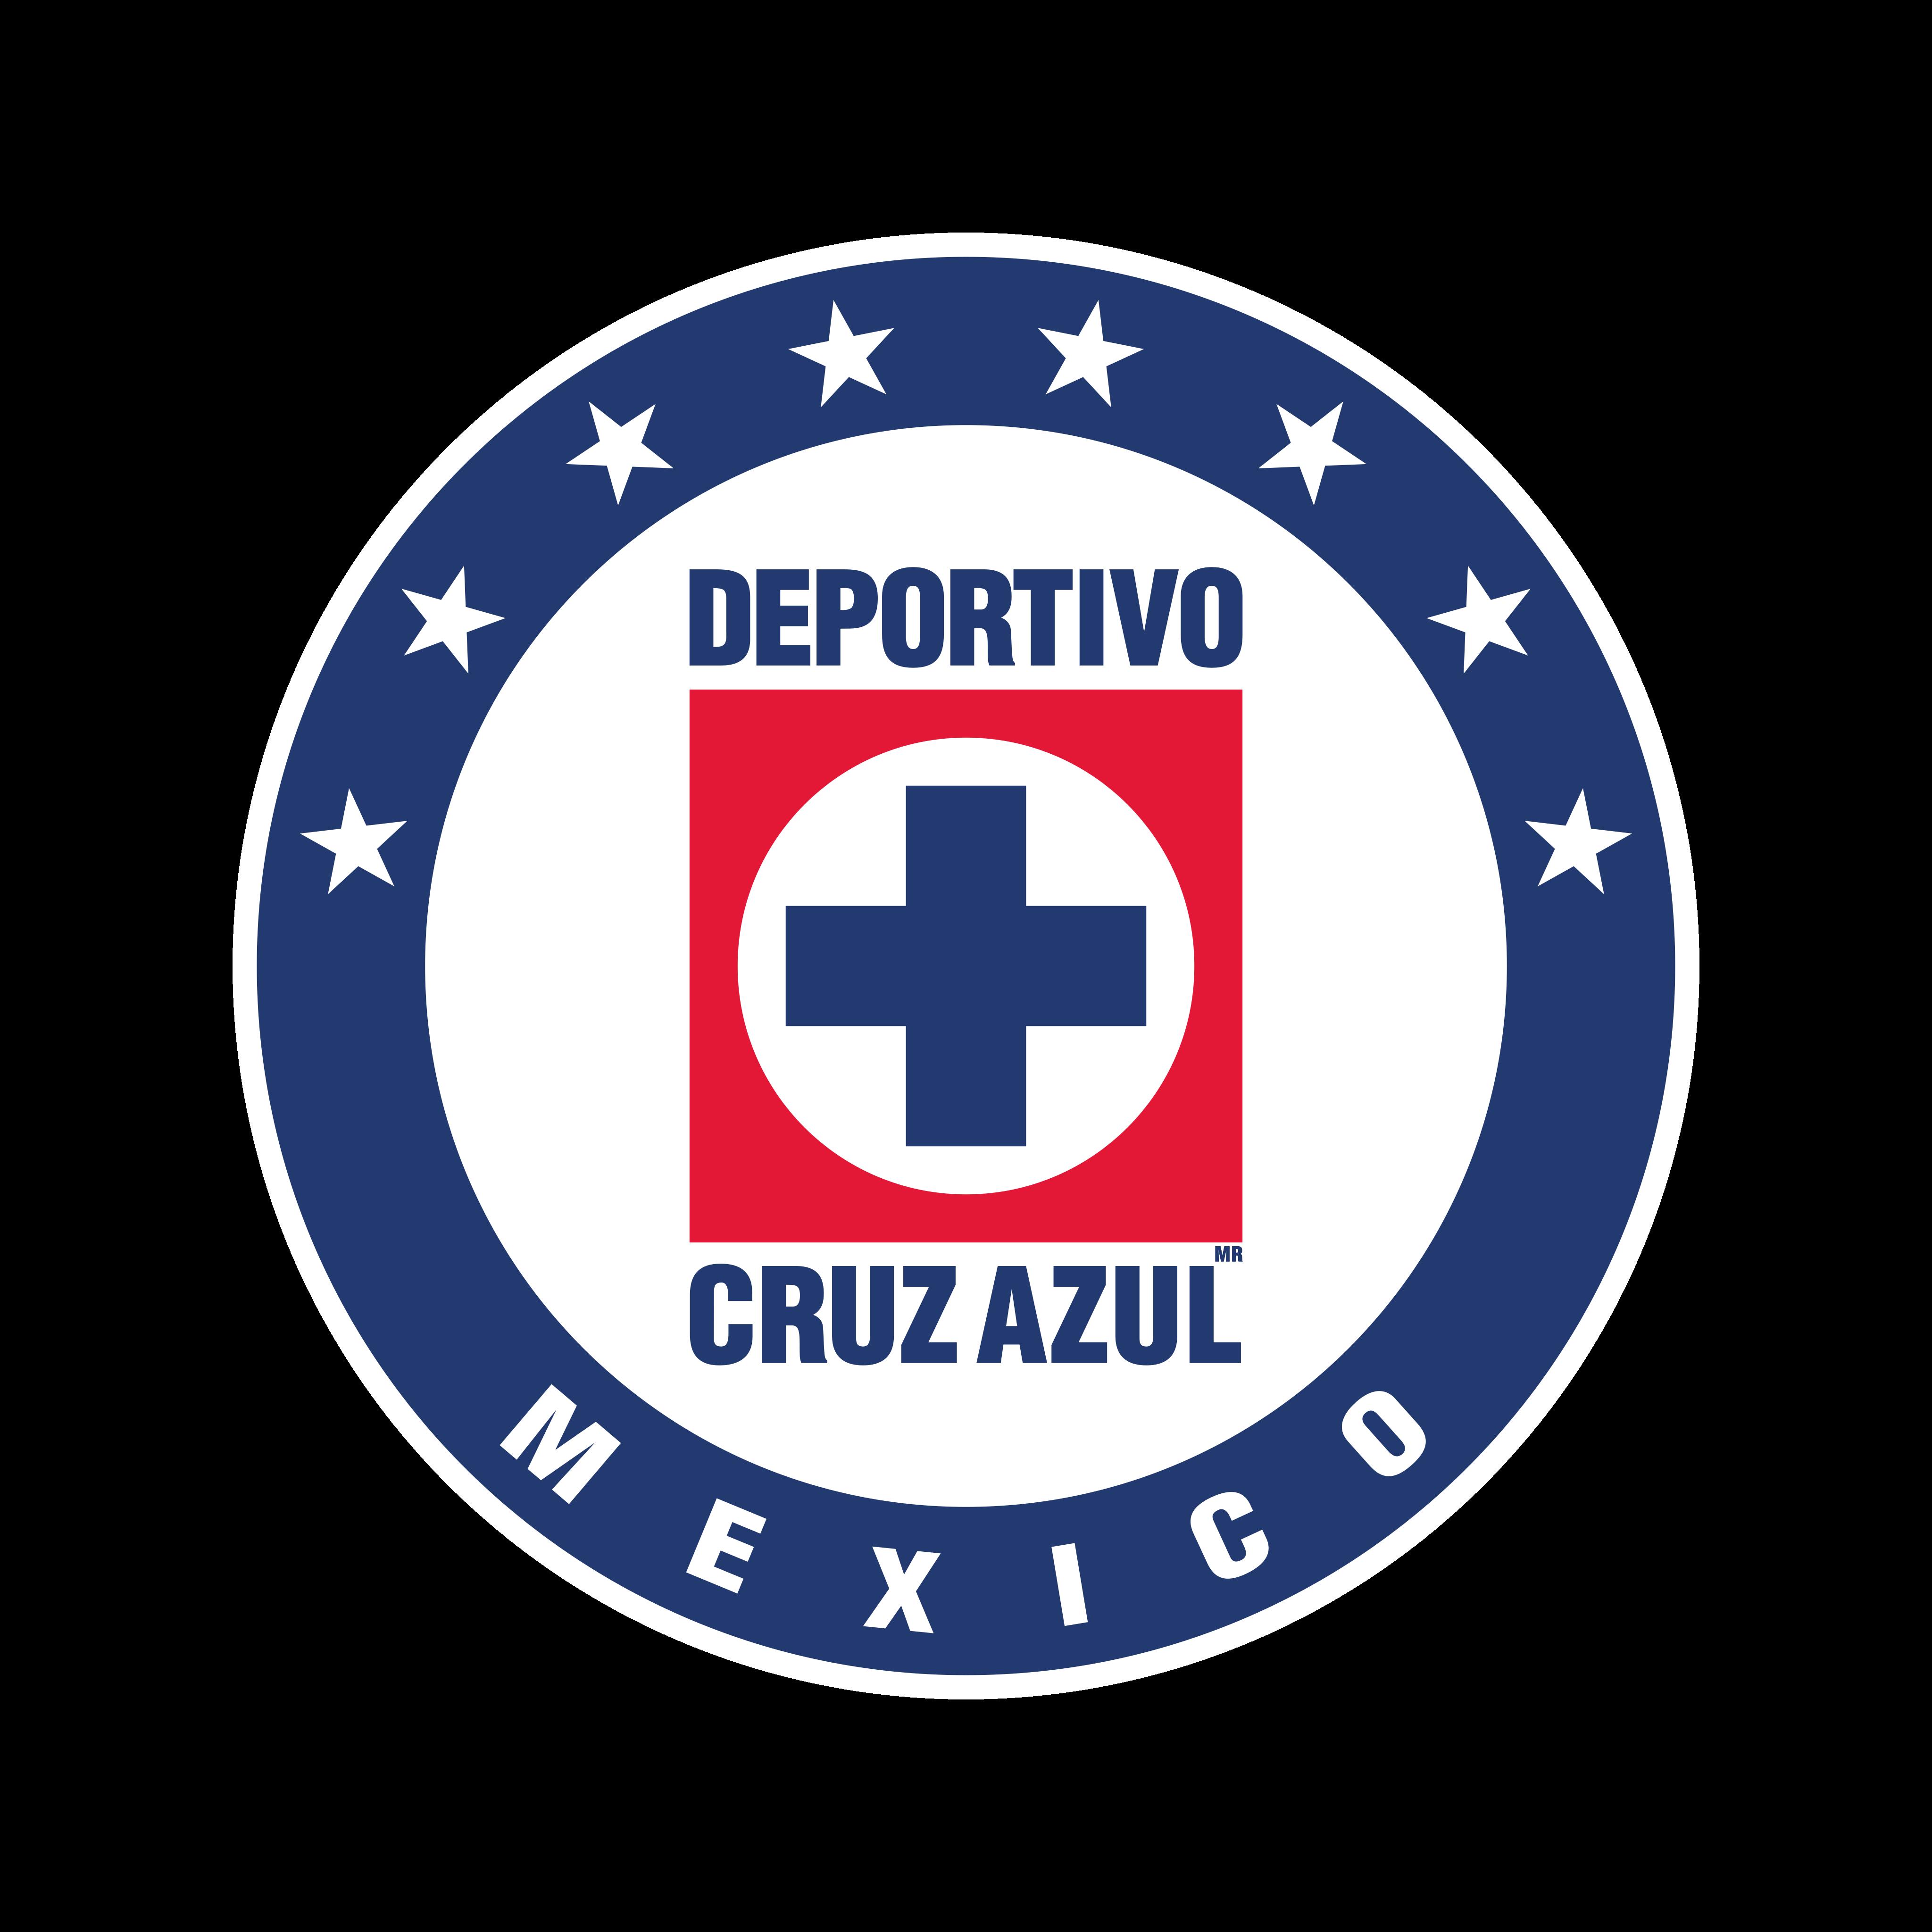 cruz azul fc logo 0 - Cruz Azul FC Logo